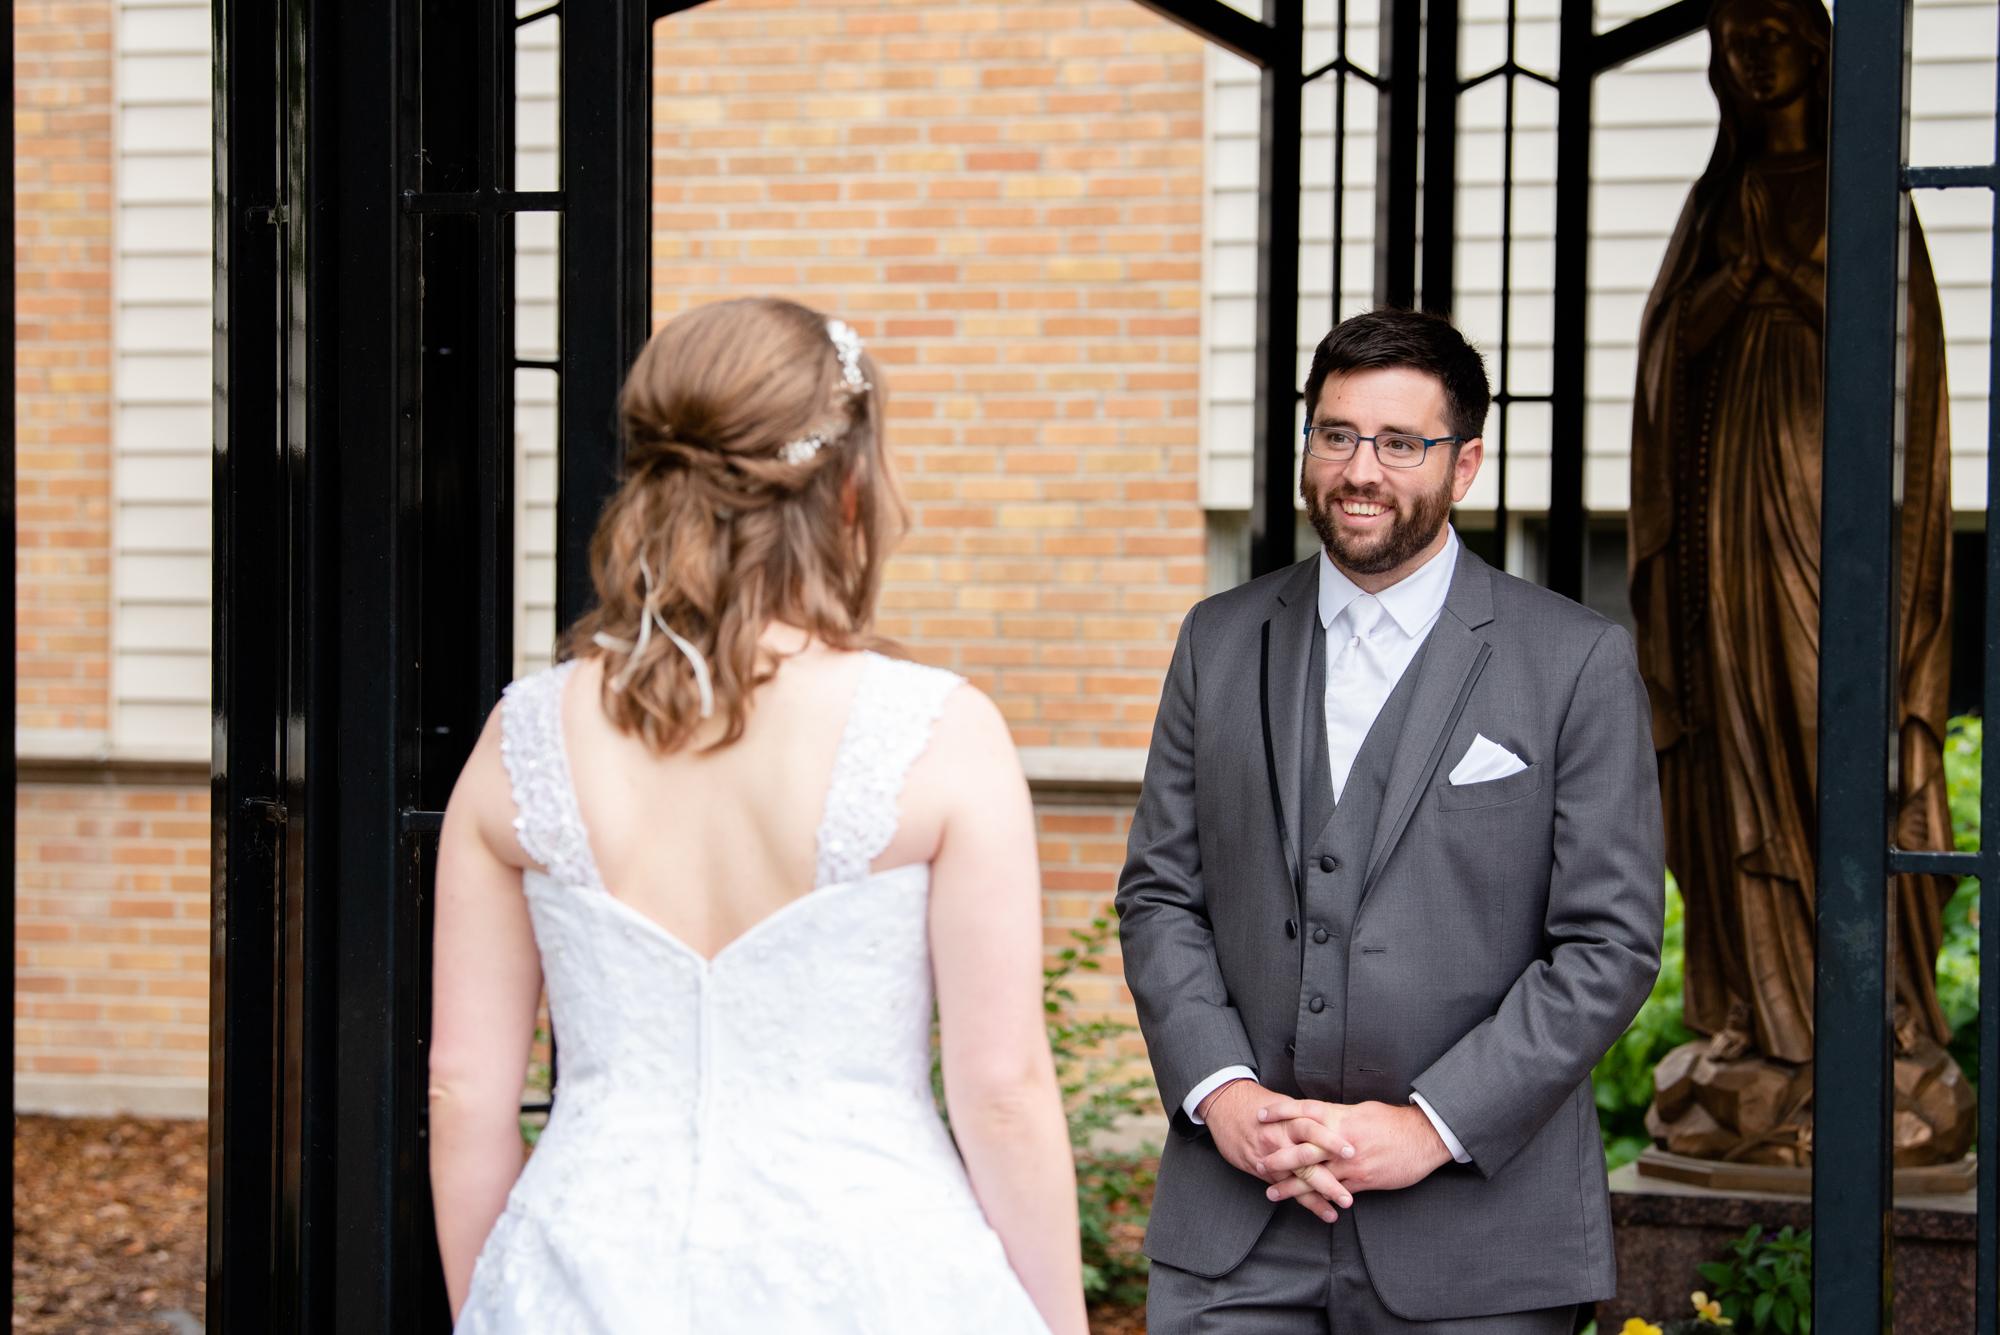 DSC 7426 - Emma and Chris | Fargo Wedding